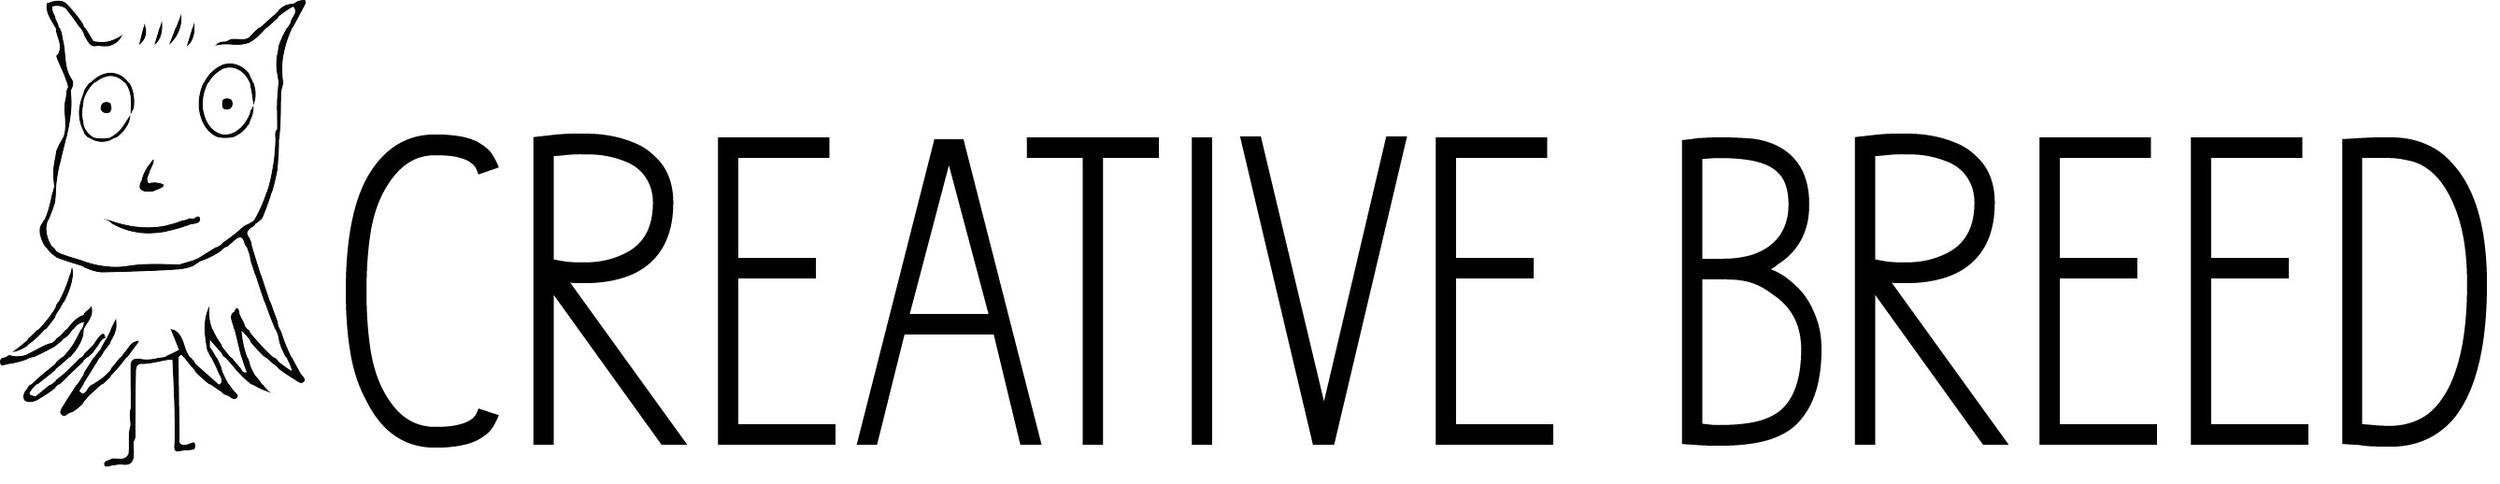 CreativeBreed_Logo